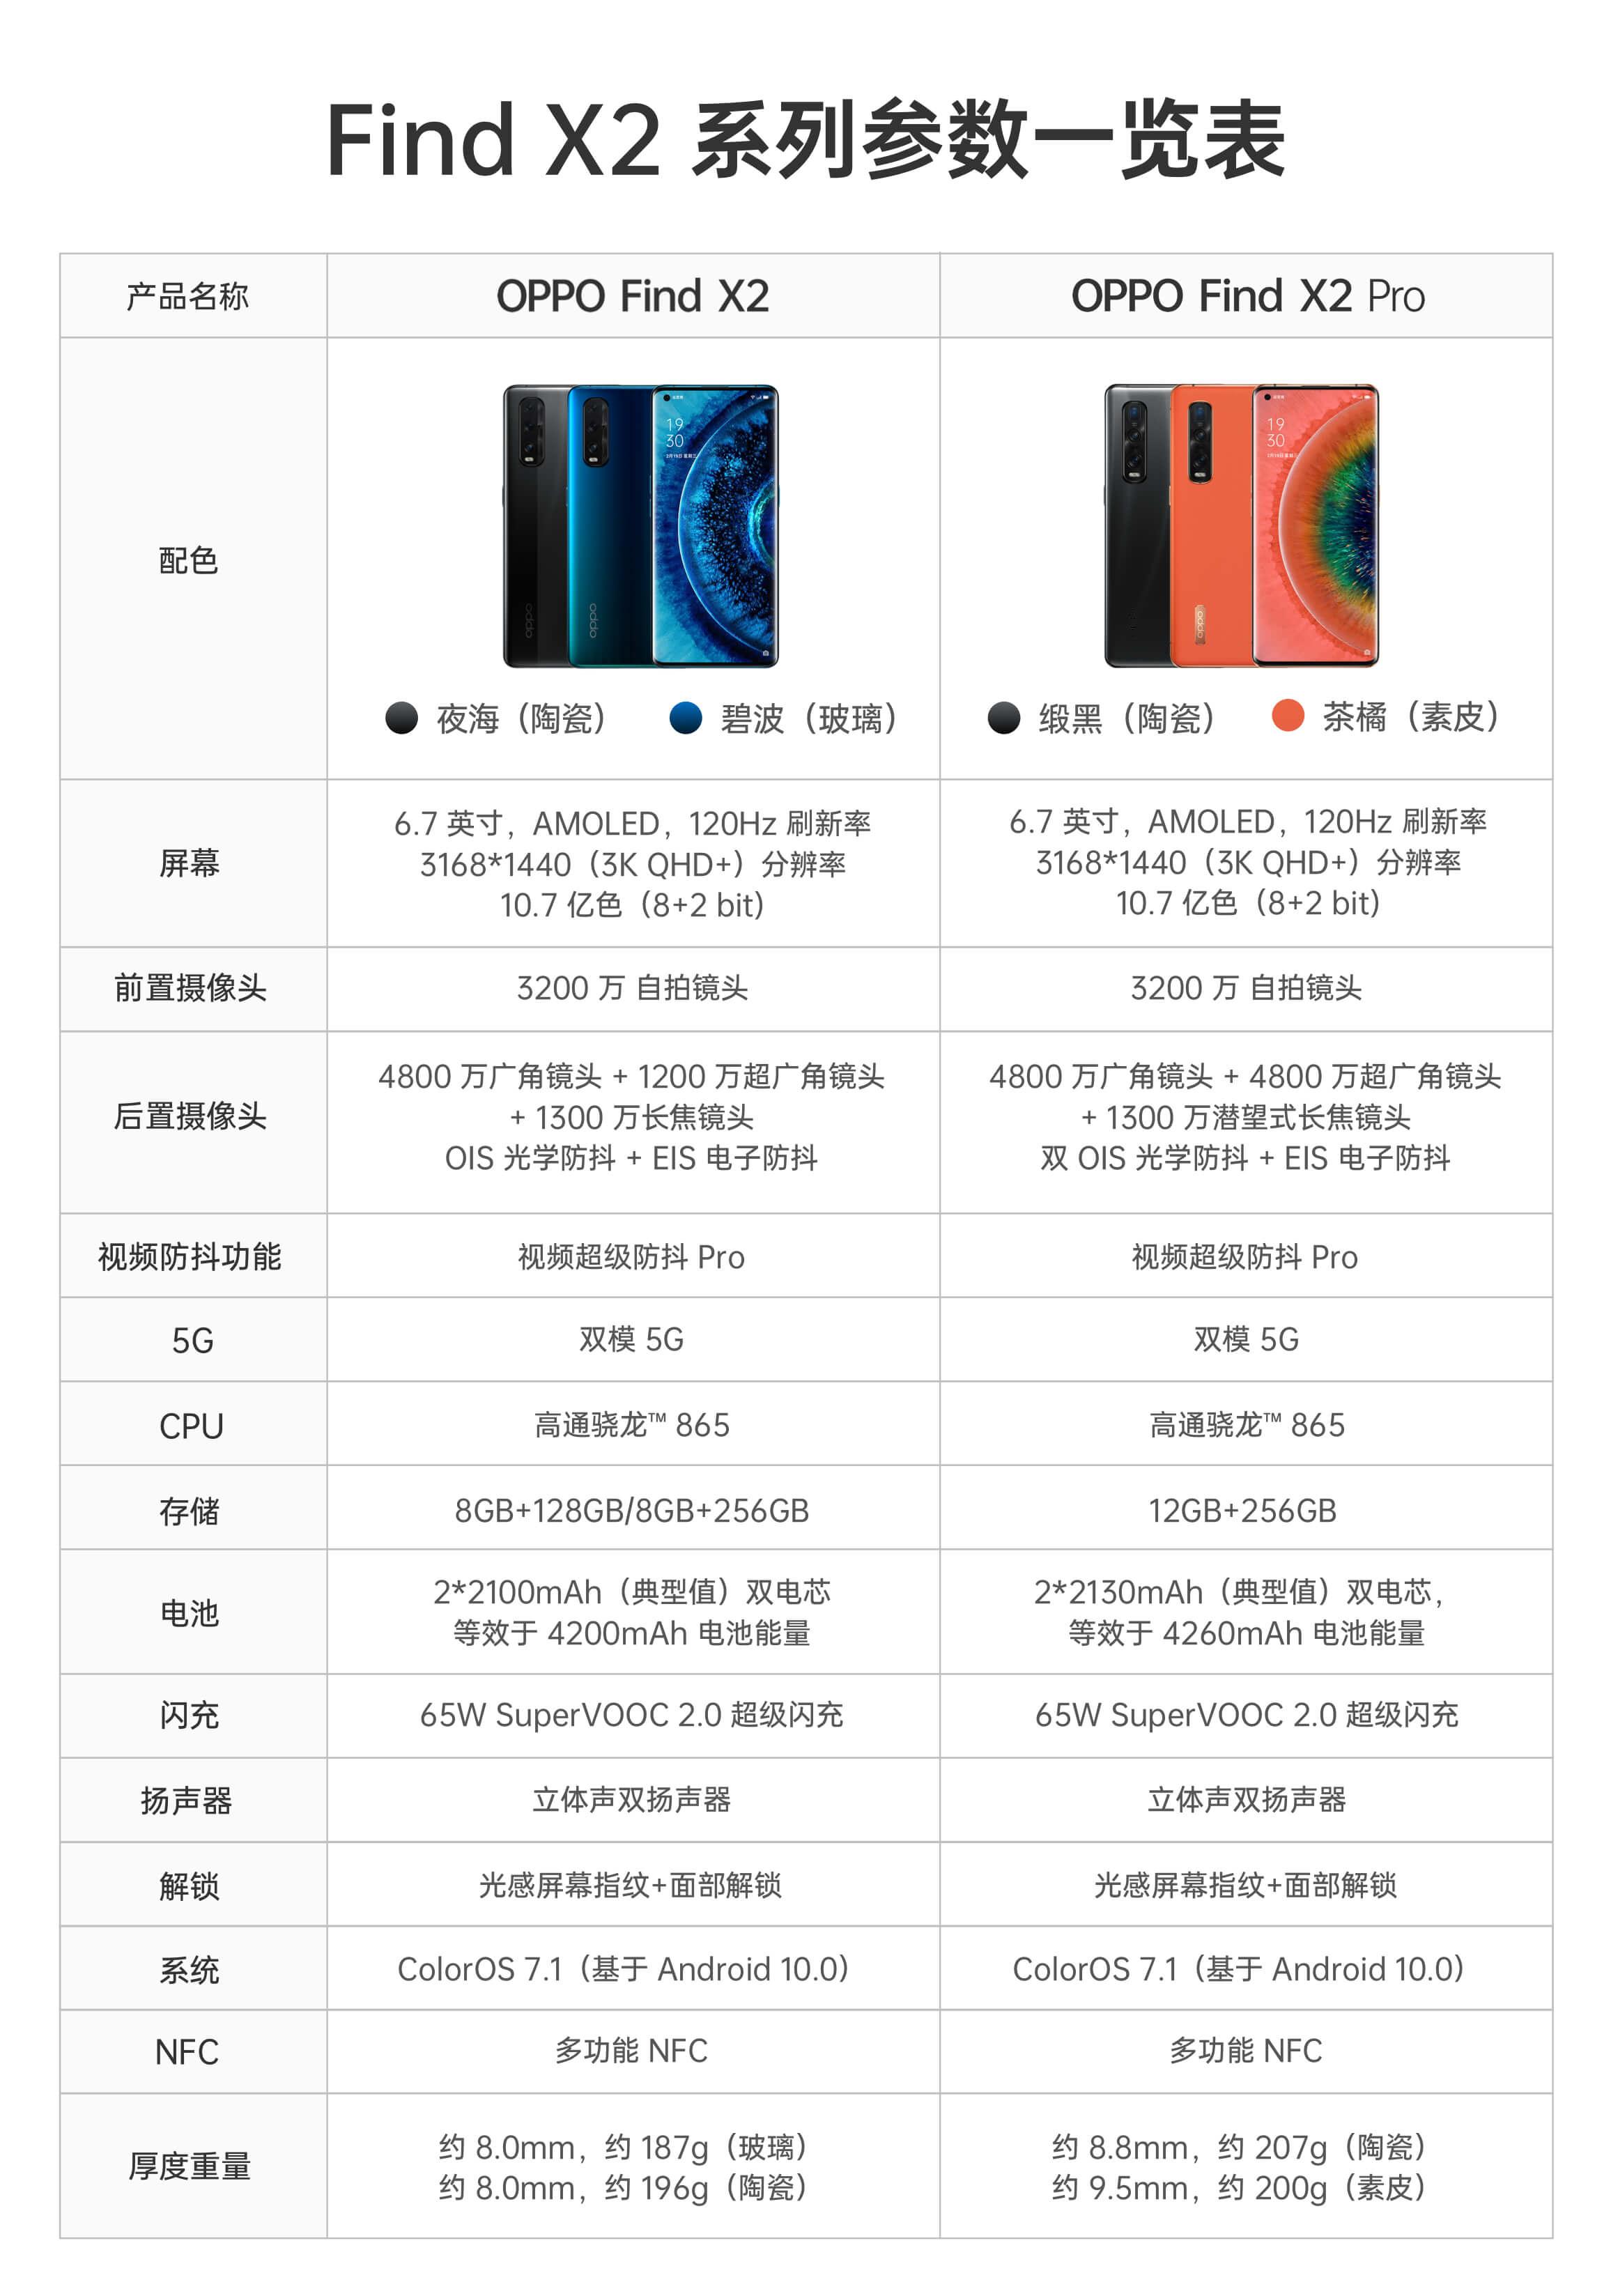 OPPO FIND X2 系列正式登陆马来西亚,120Hz + 3K 超感显示屏售价 RM3999 起 5